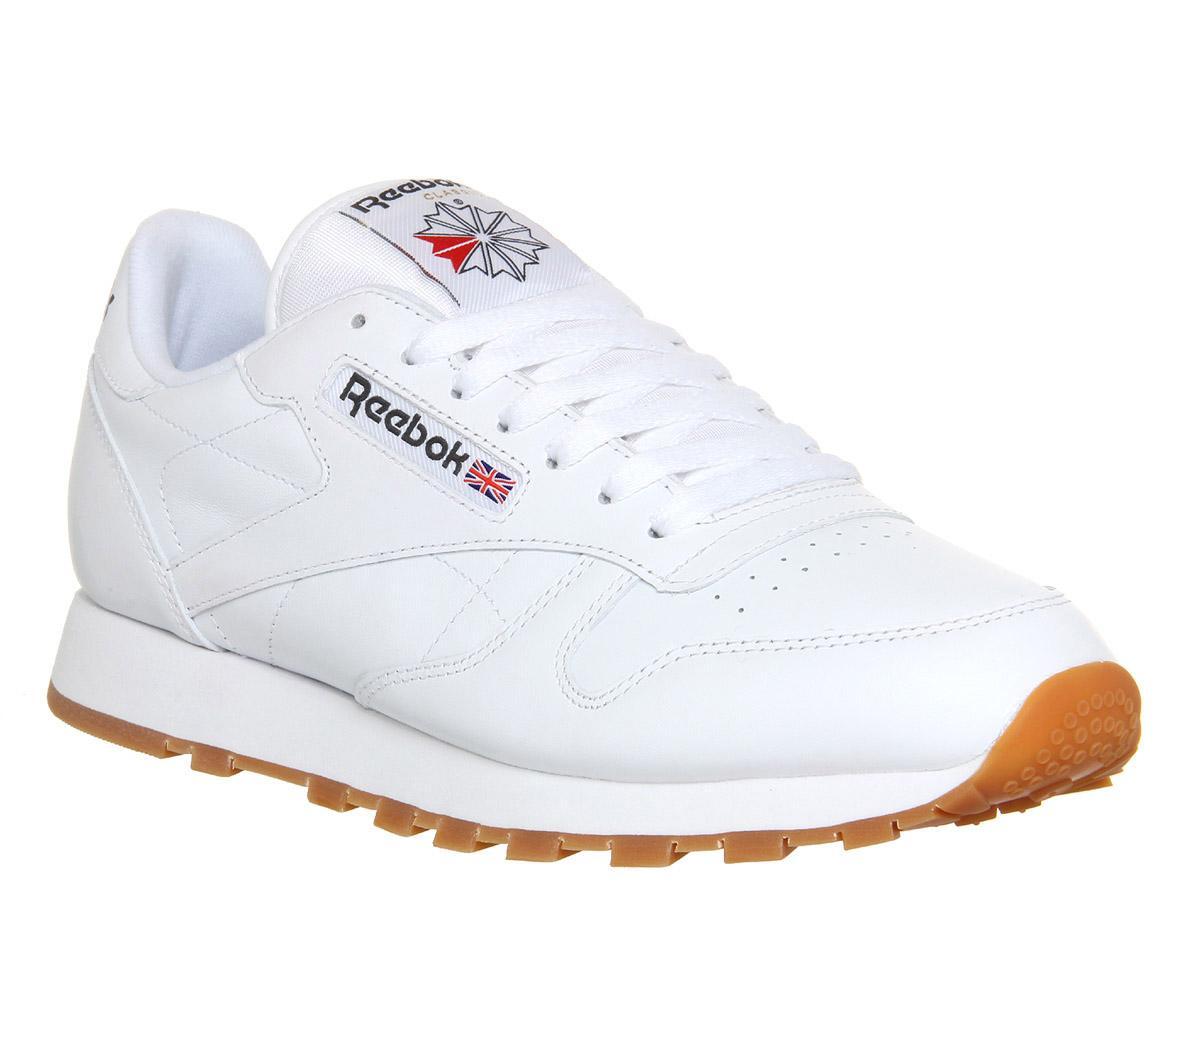 Reebok Cl Leather White Gum - Unisex Sports